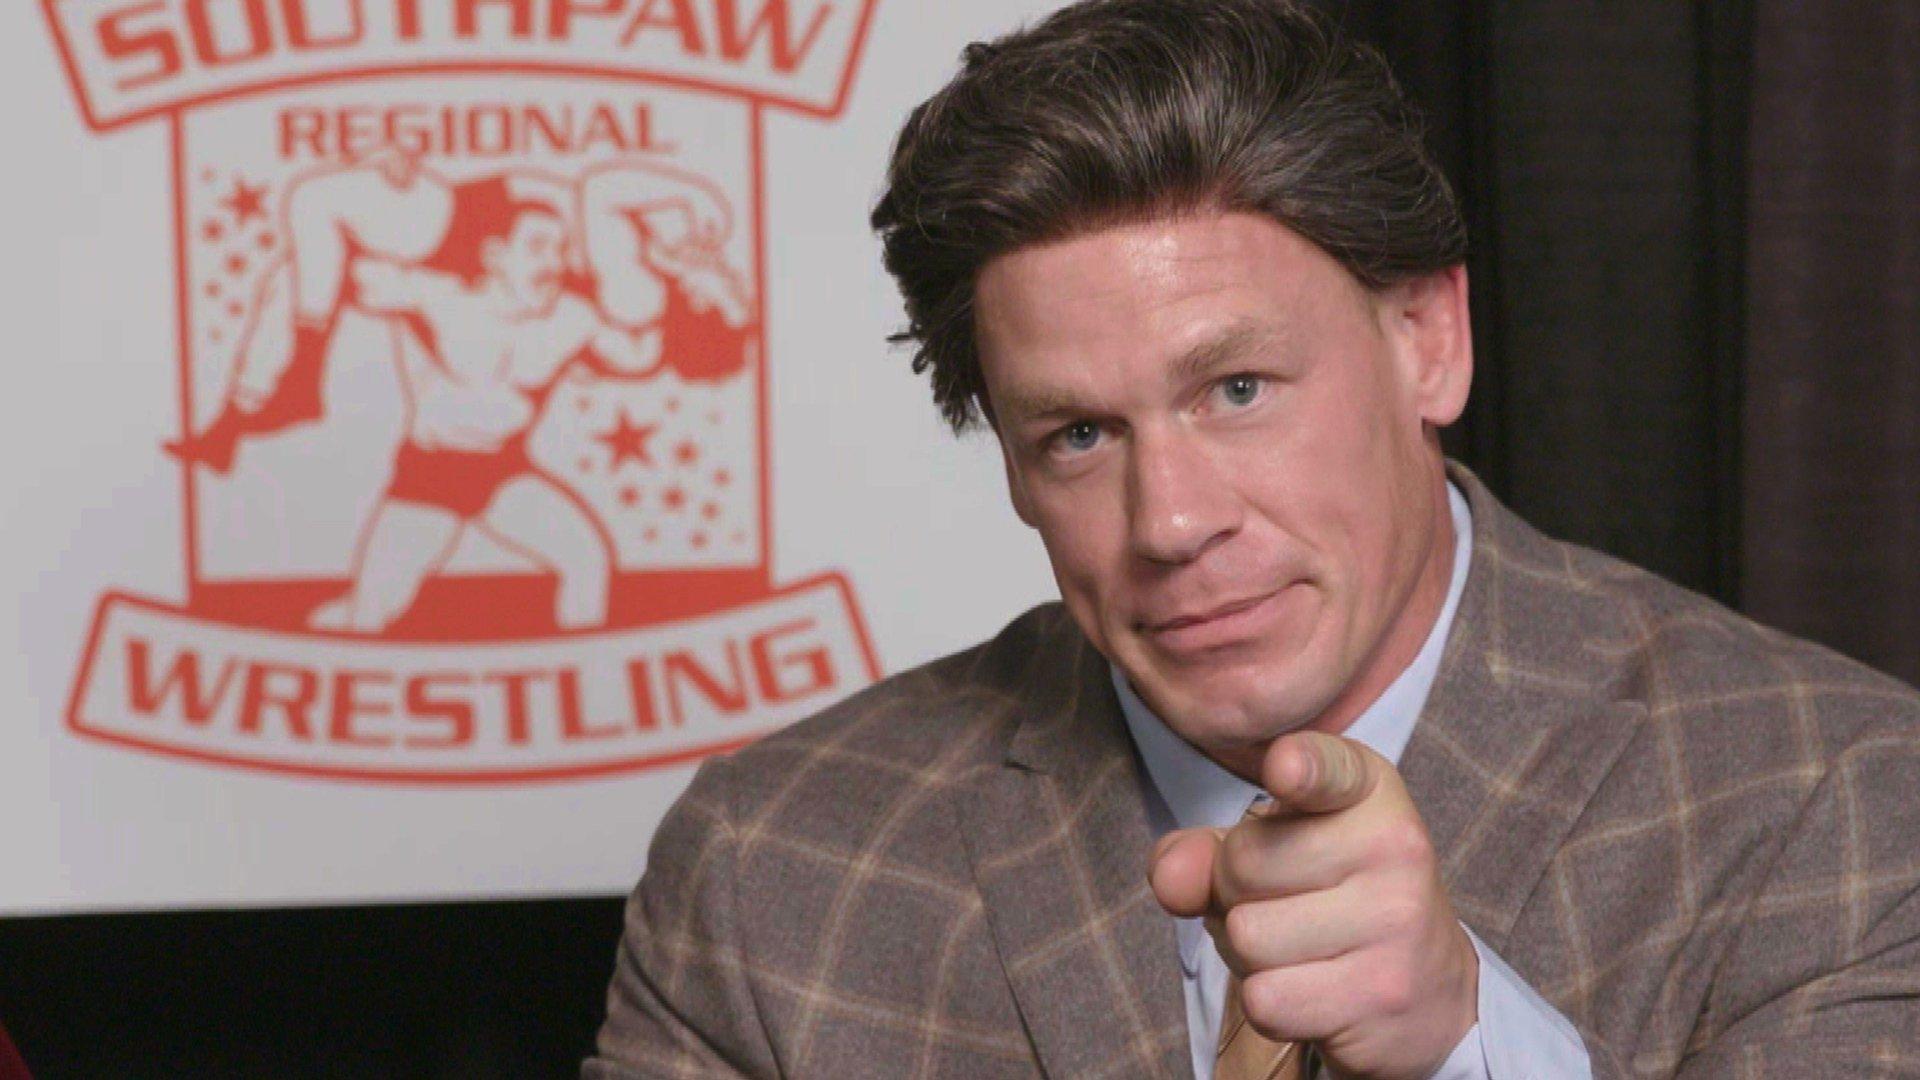 Southpaw Regional Wrestling est enfin découverte: Southpaw Regional Wrestling - Episode 1